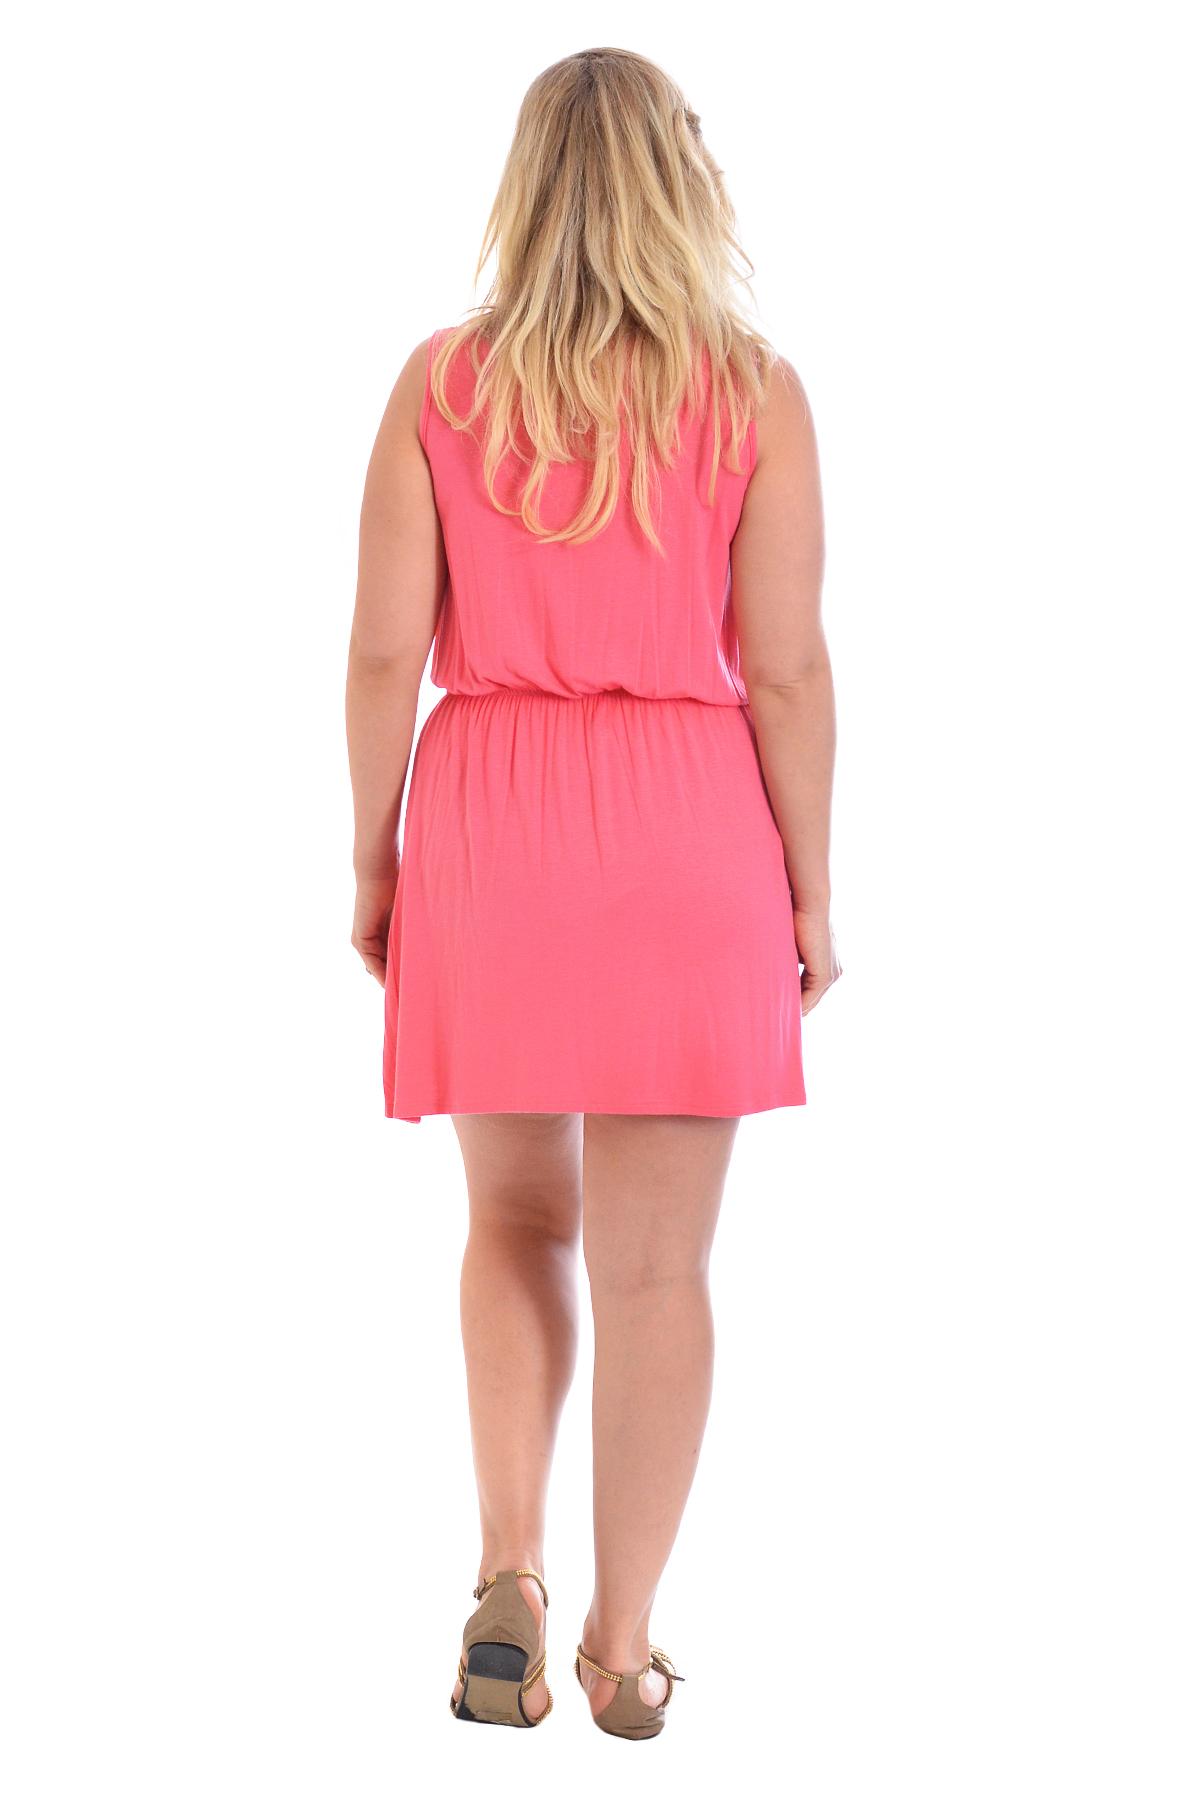 New Ladies Tunic Womens Lace Neck Skater Style Dress Floral Plus Size Nouvelle